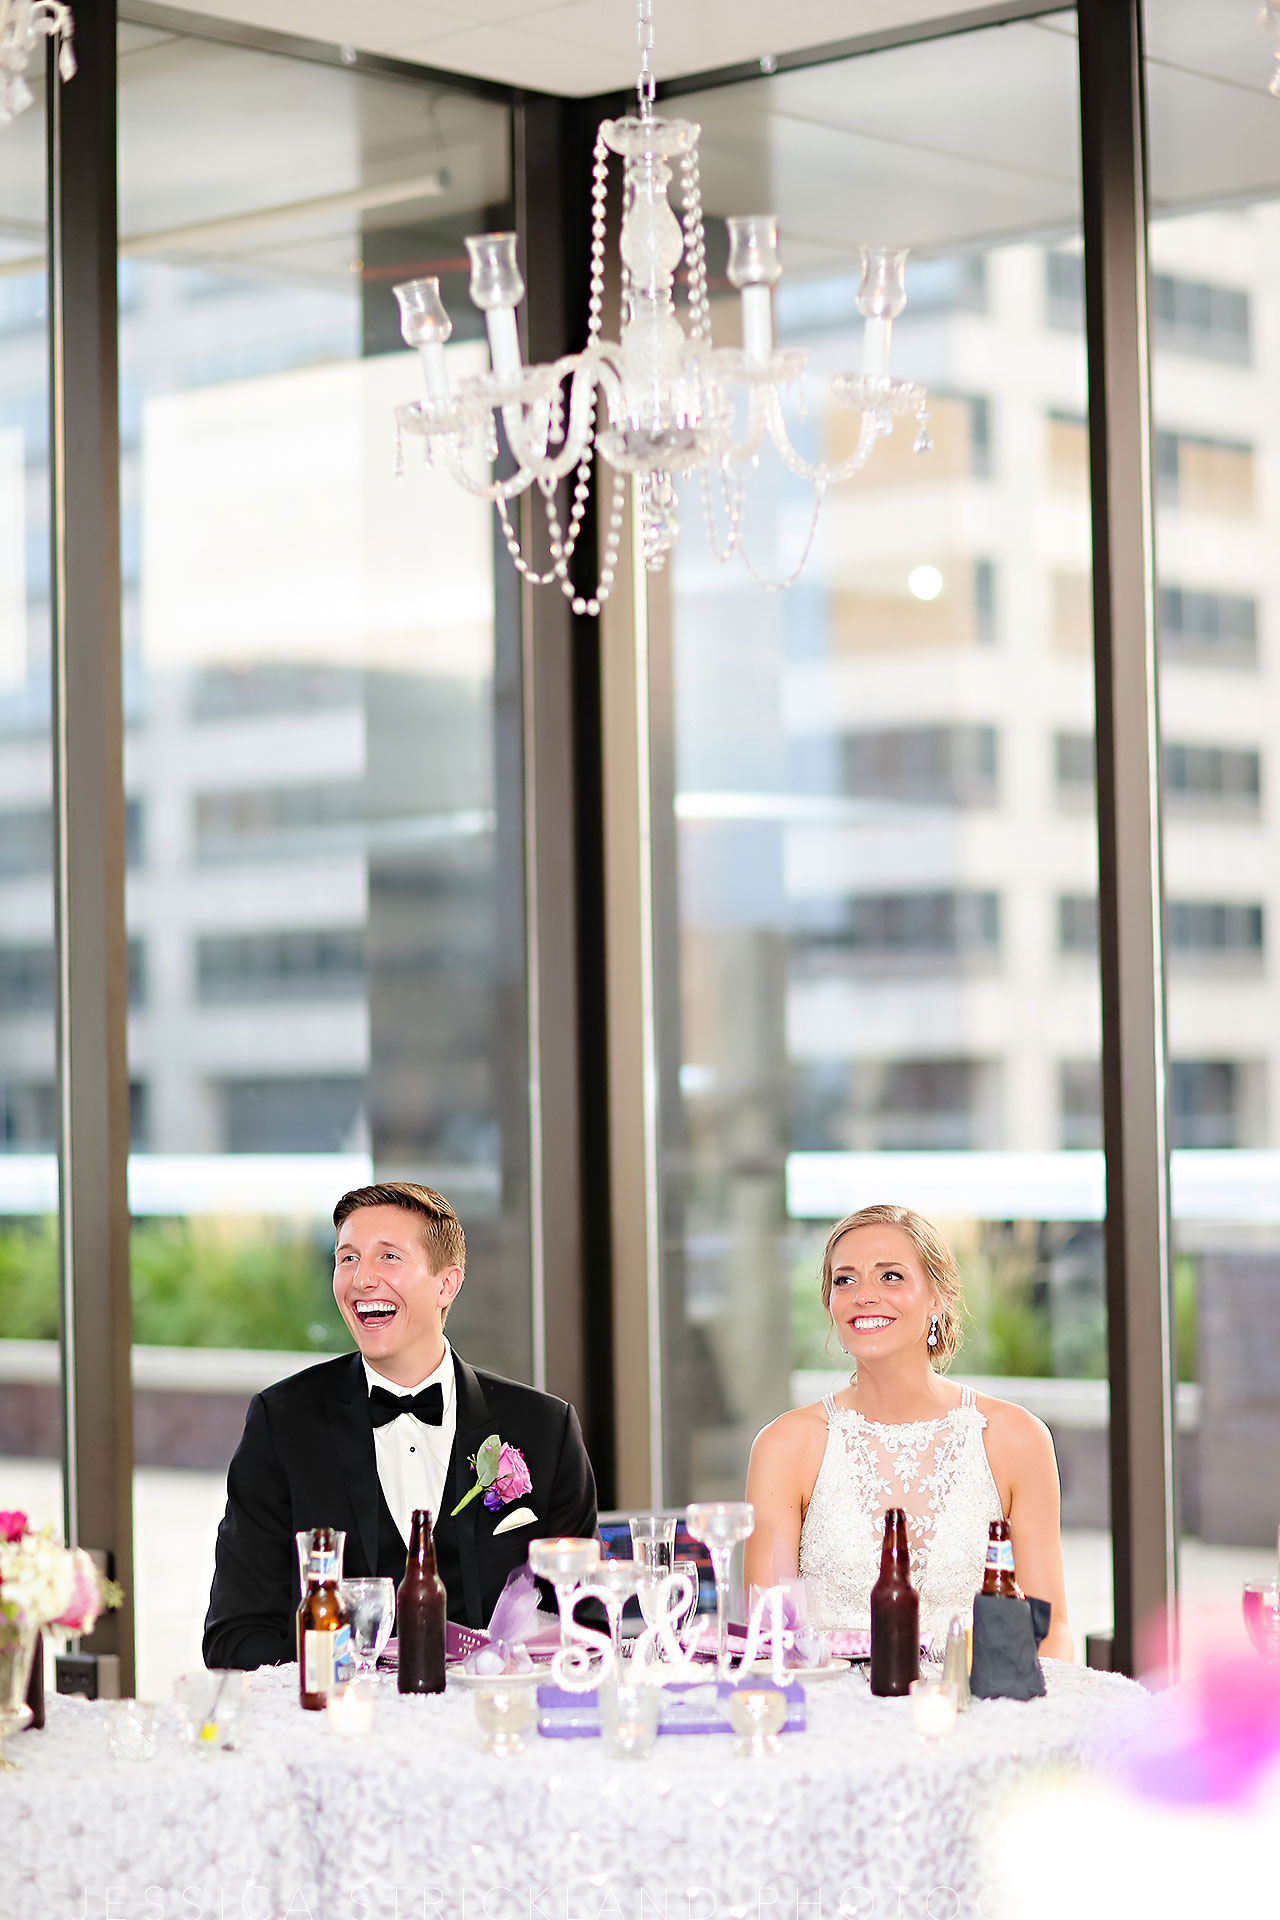 Serra Alex Regions Tower Indianapolis Wedding 310 watermarked